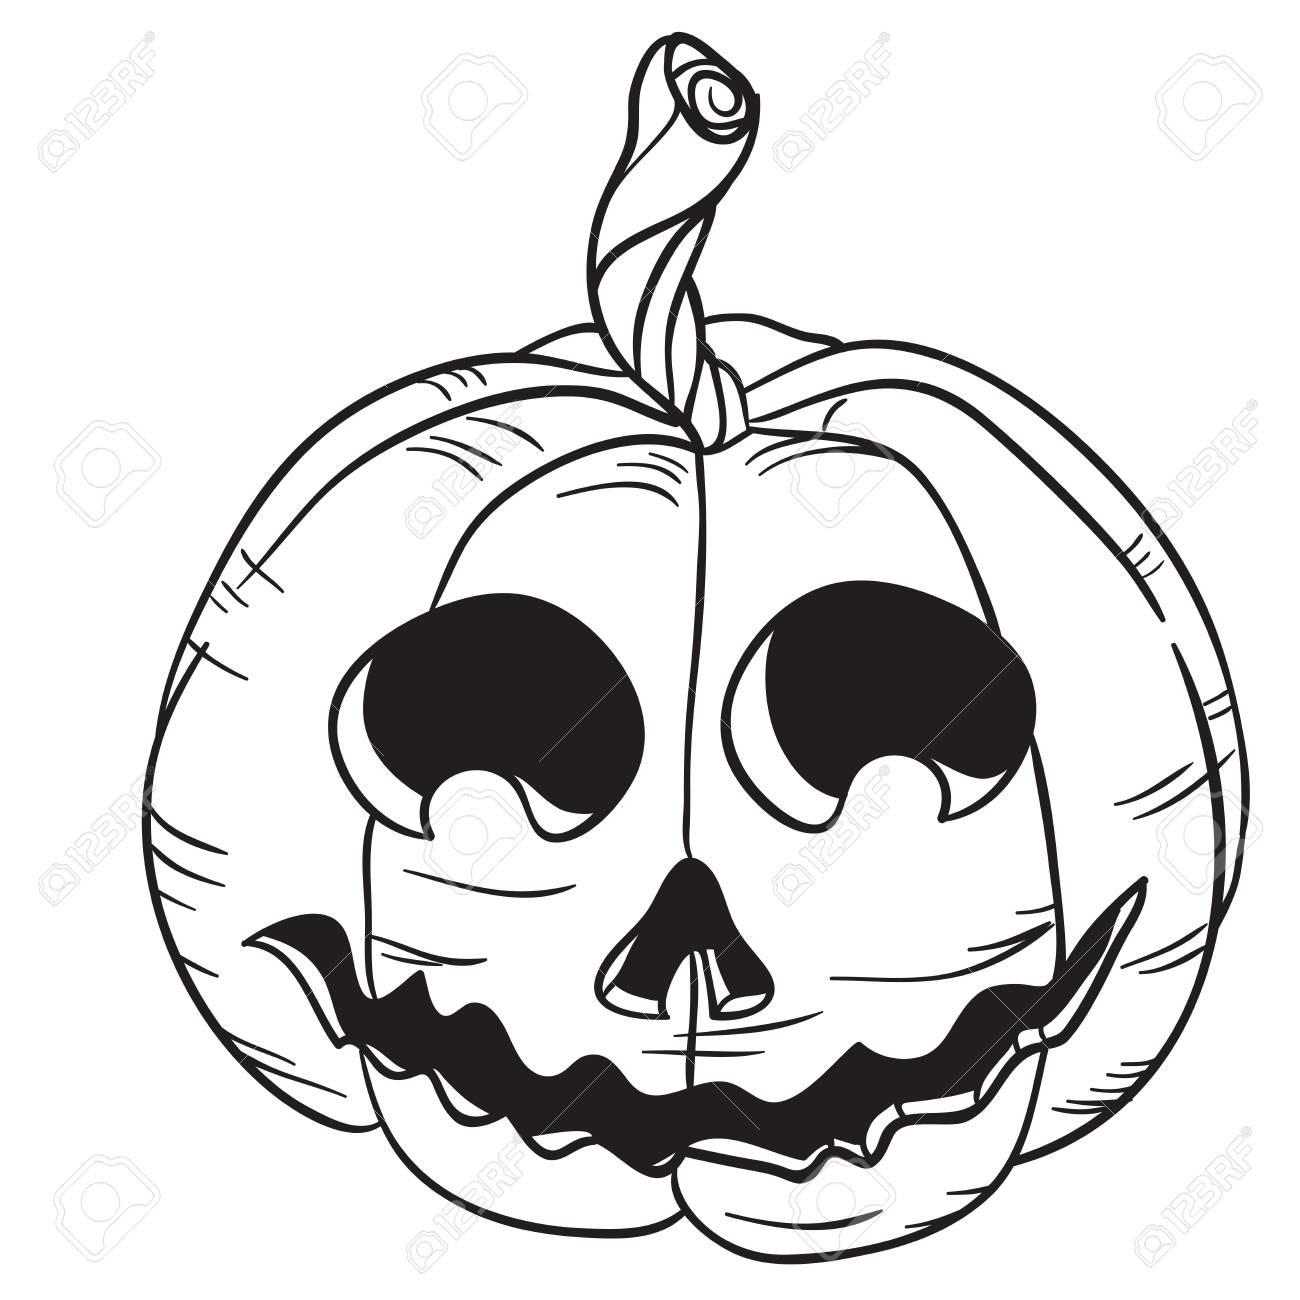 Halloween Pumpkin Black And White Cartoon Illustration Isolated